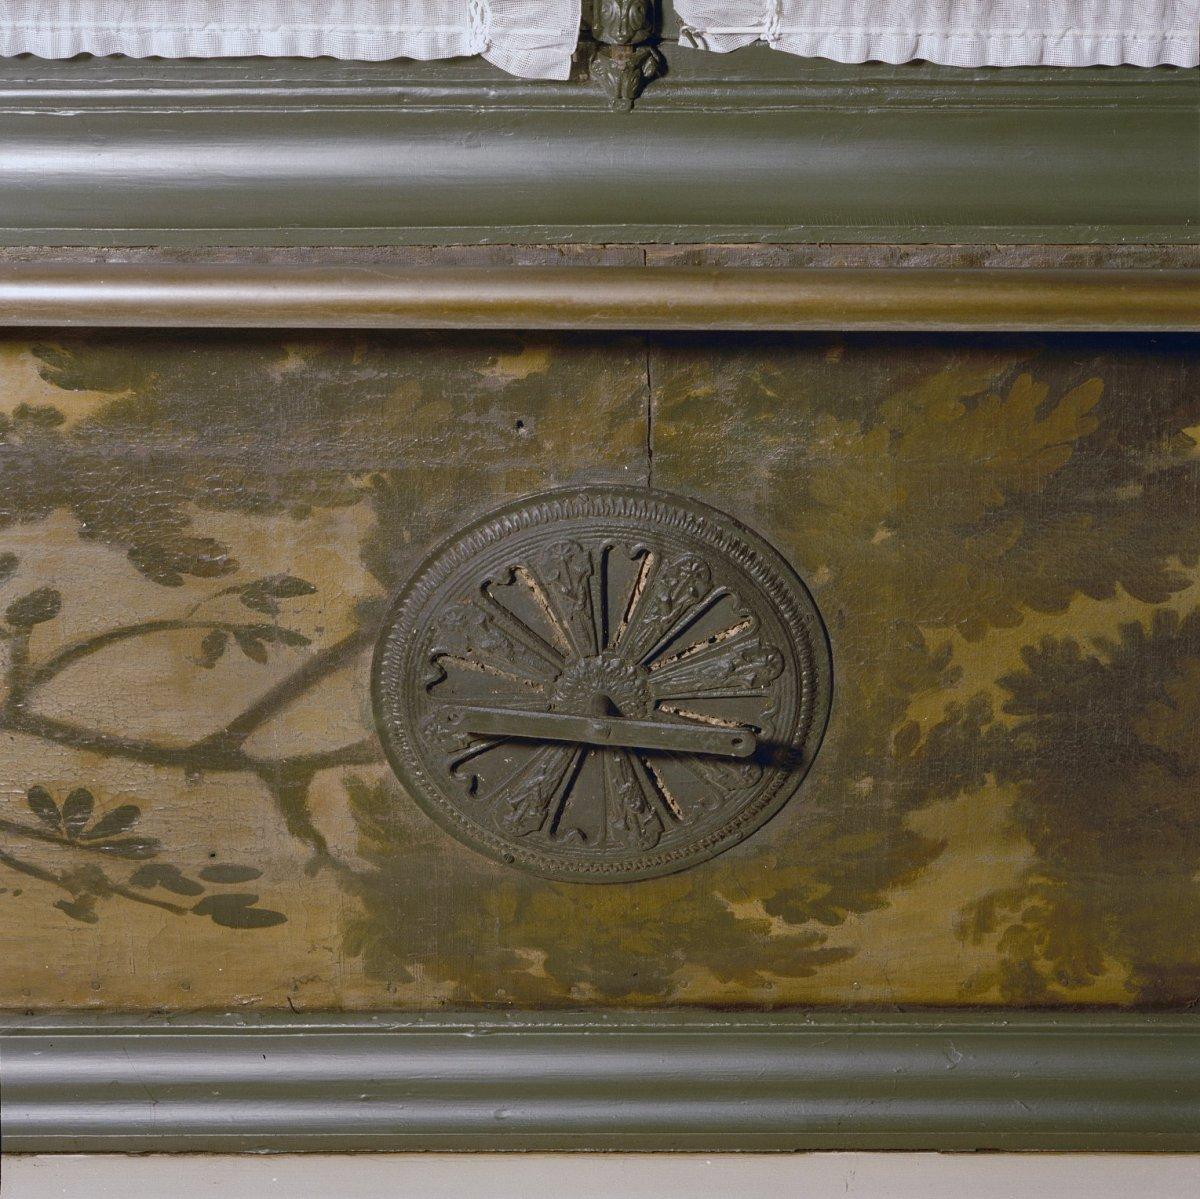 File interieur regentenkamer ventilatie rooster for Interieur haarlem